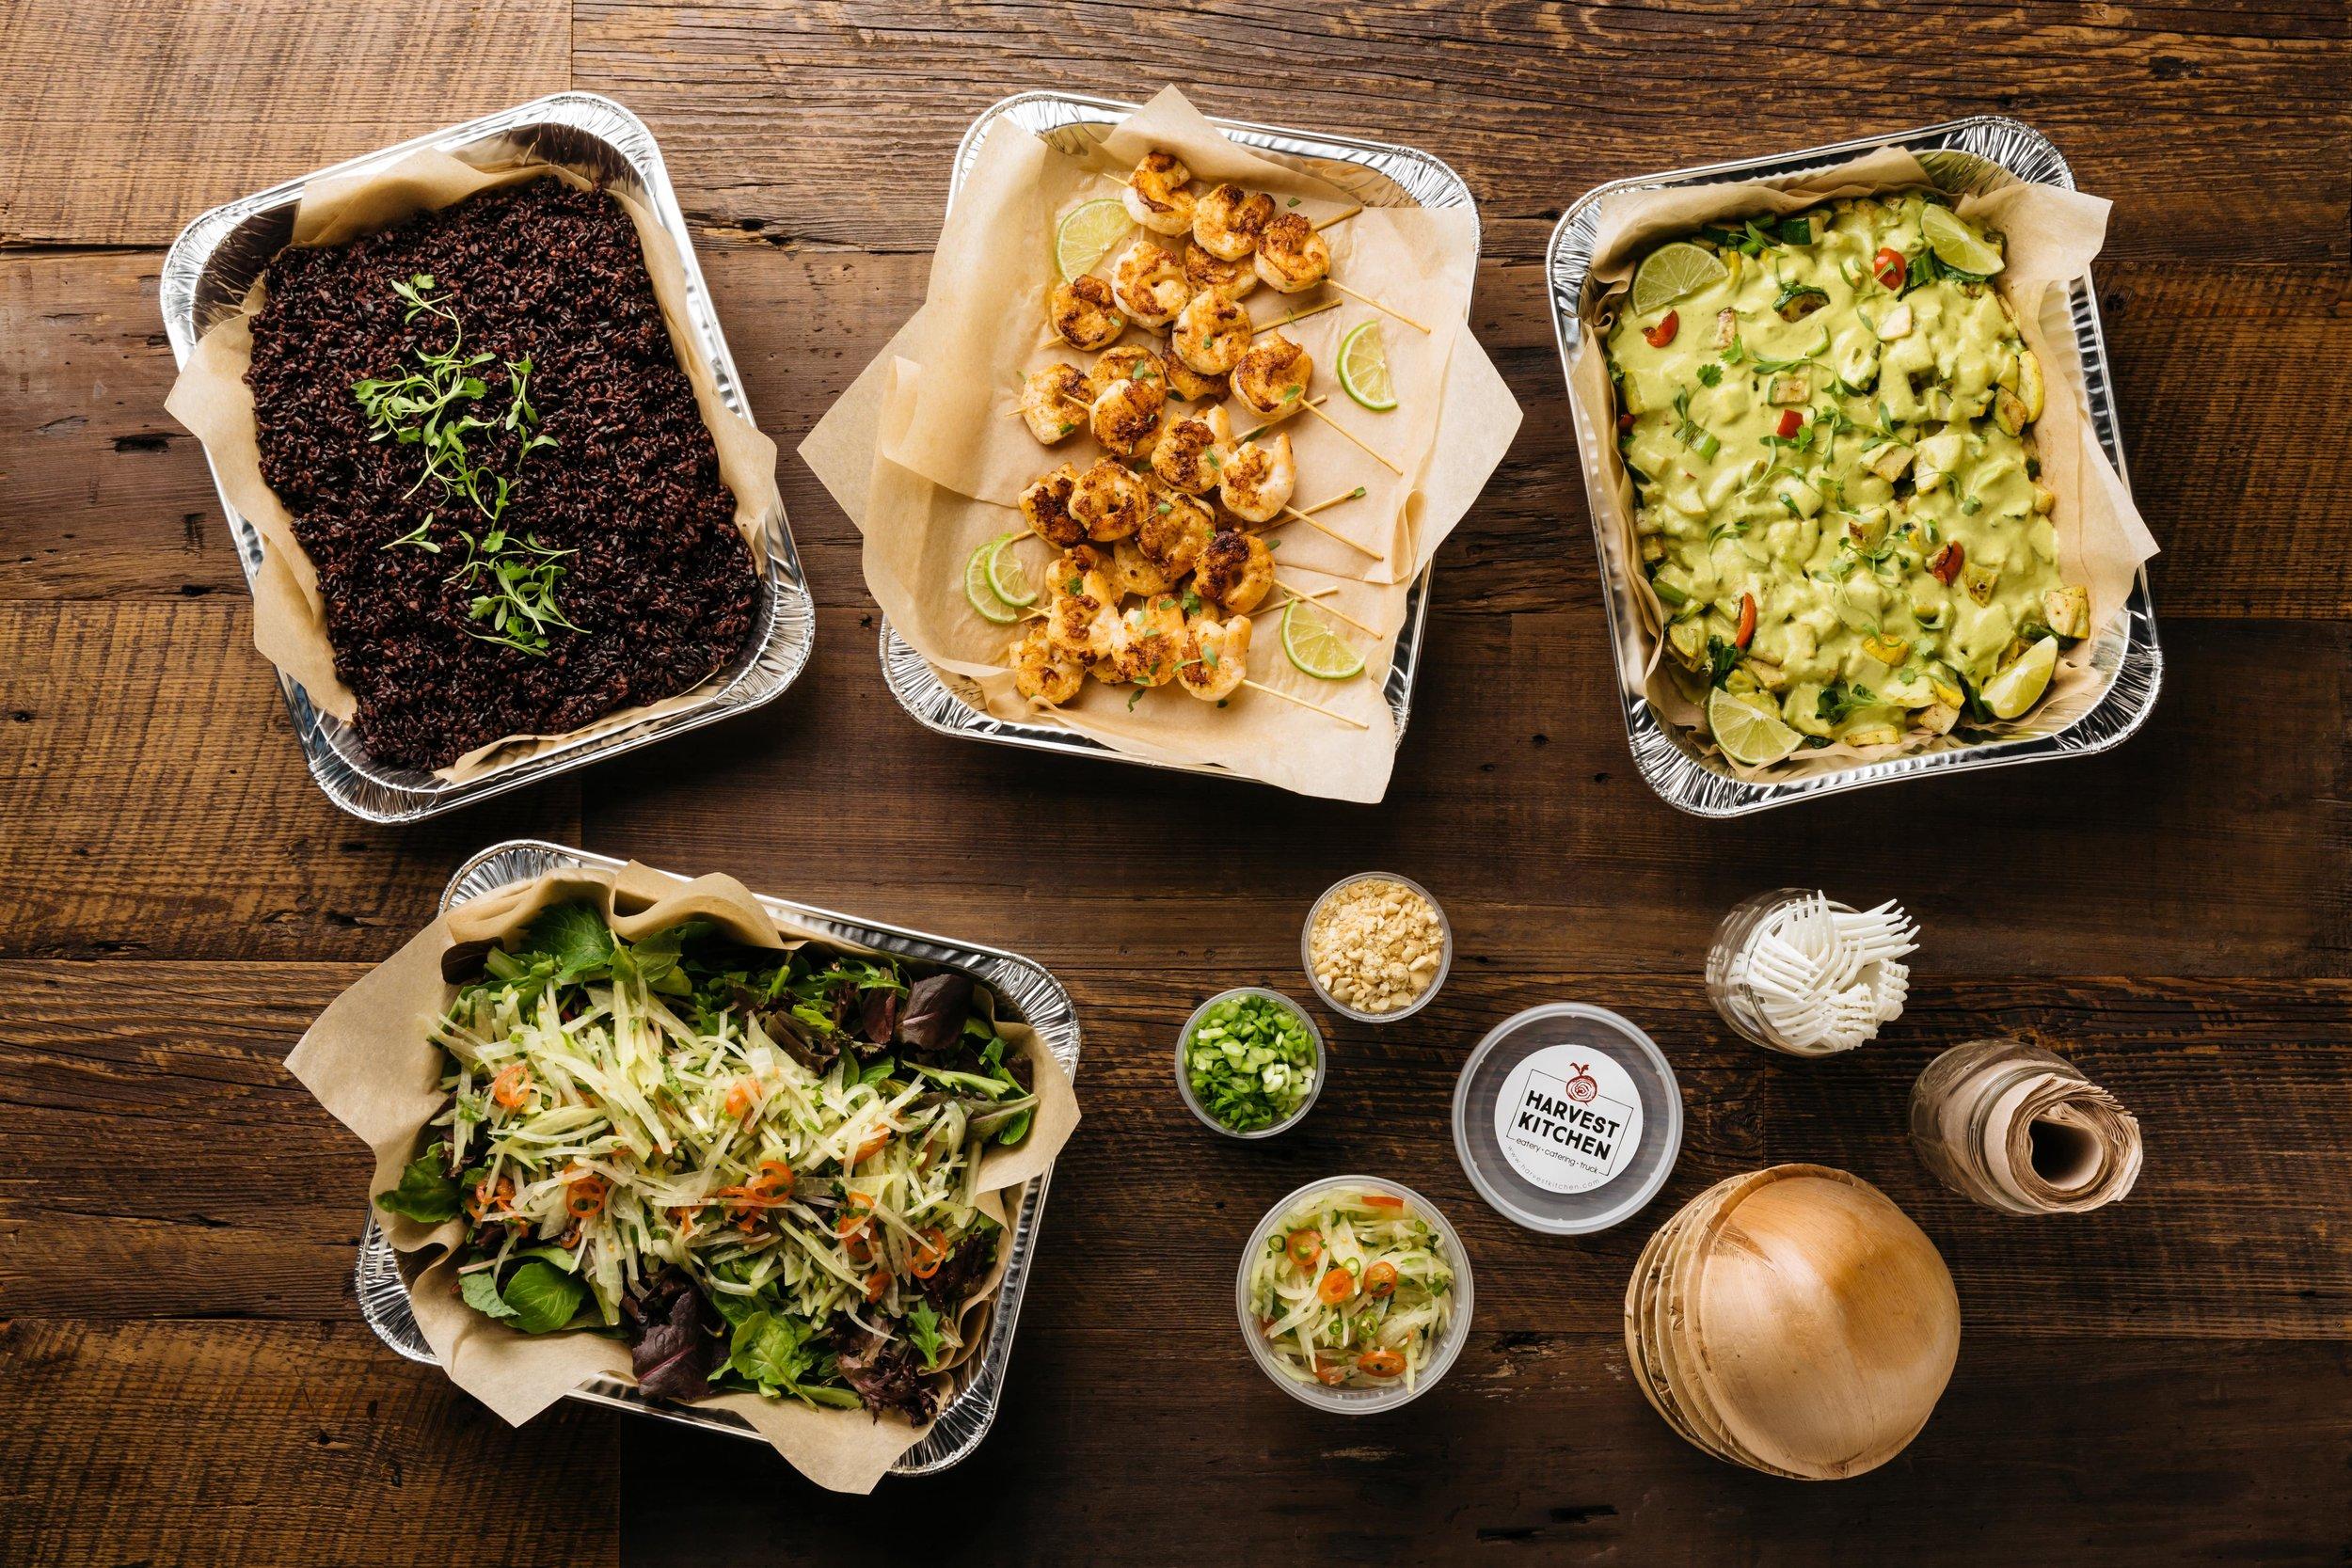 fresh plated organic food catering  San Diego, Palm Springs, Joshua Tree, Temecula, Vista, CA